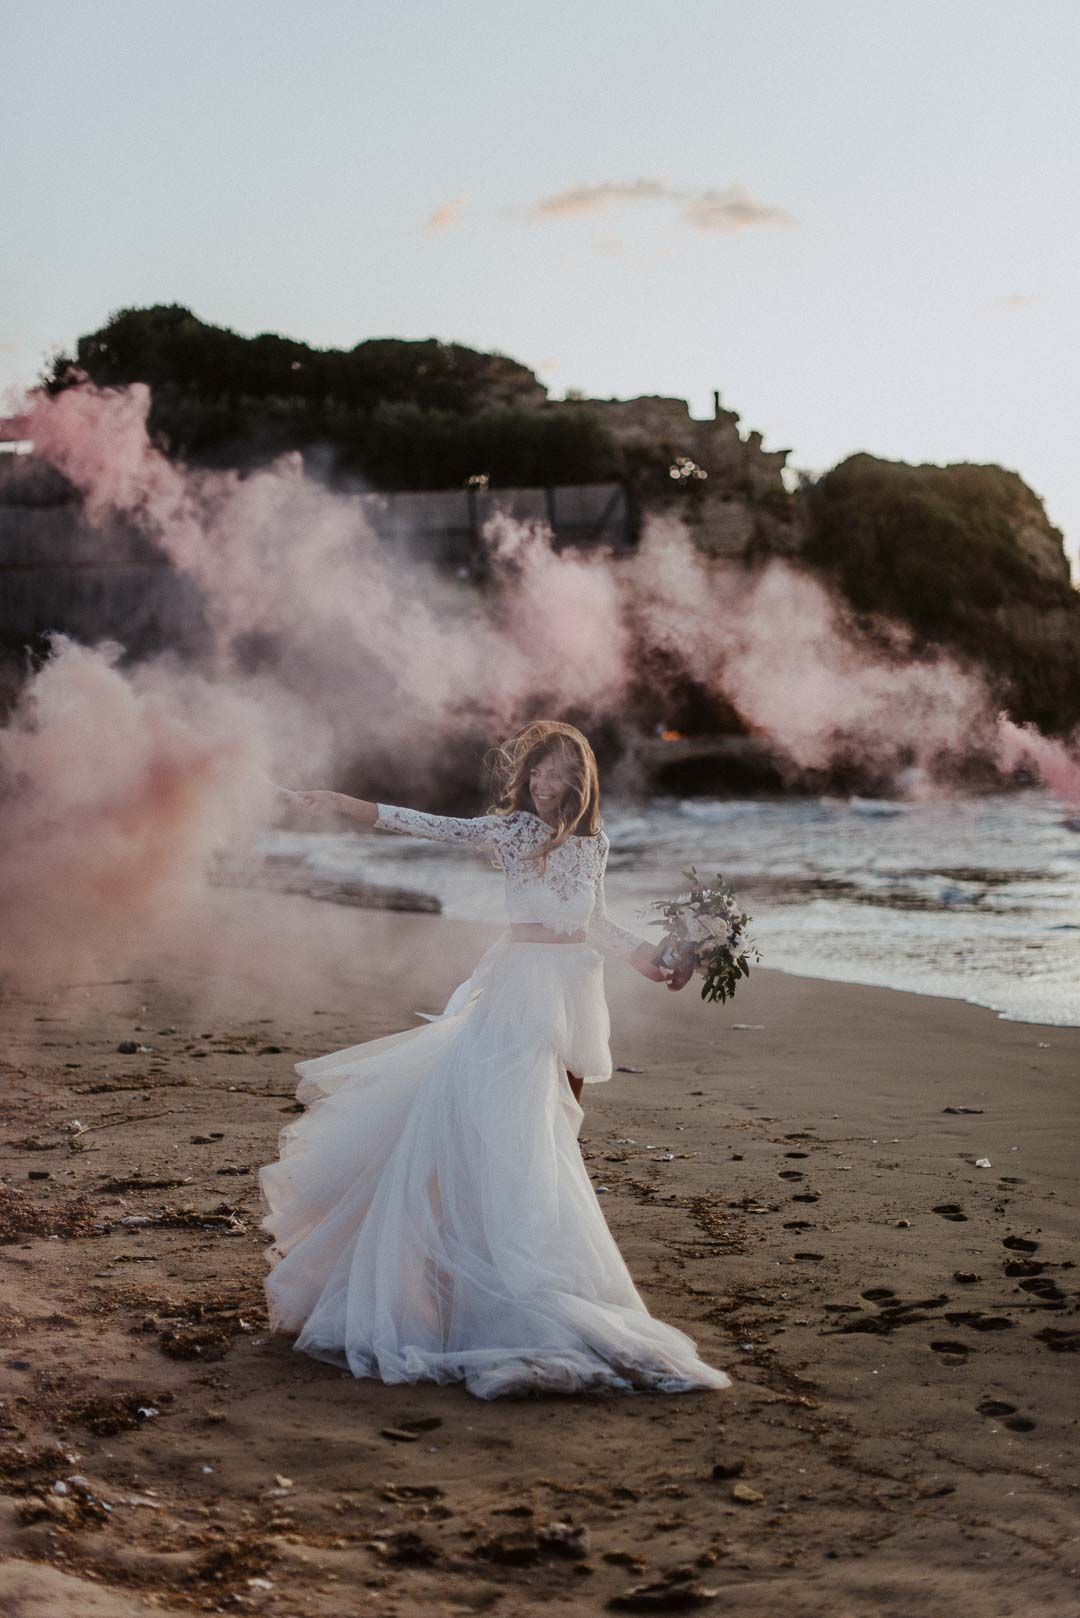 wedding-photographer-destination-fineart-bespoke-reportage-napoli-nabilah-vivianeizzo-spazio46-140